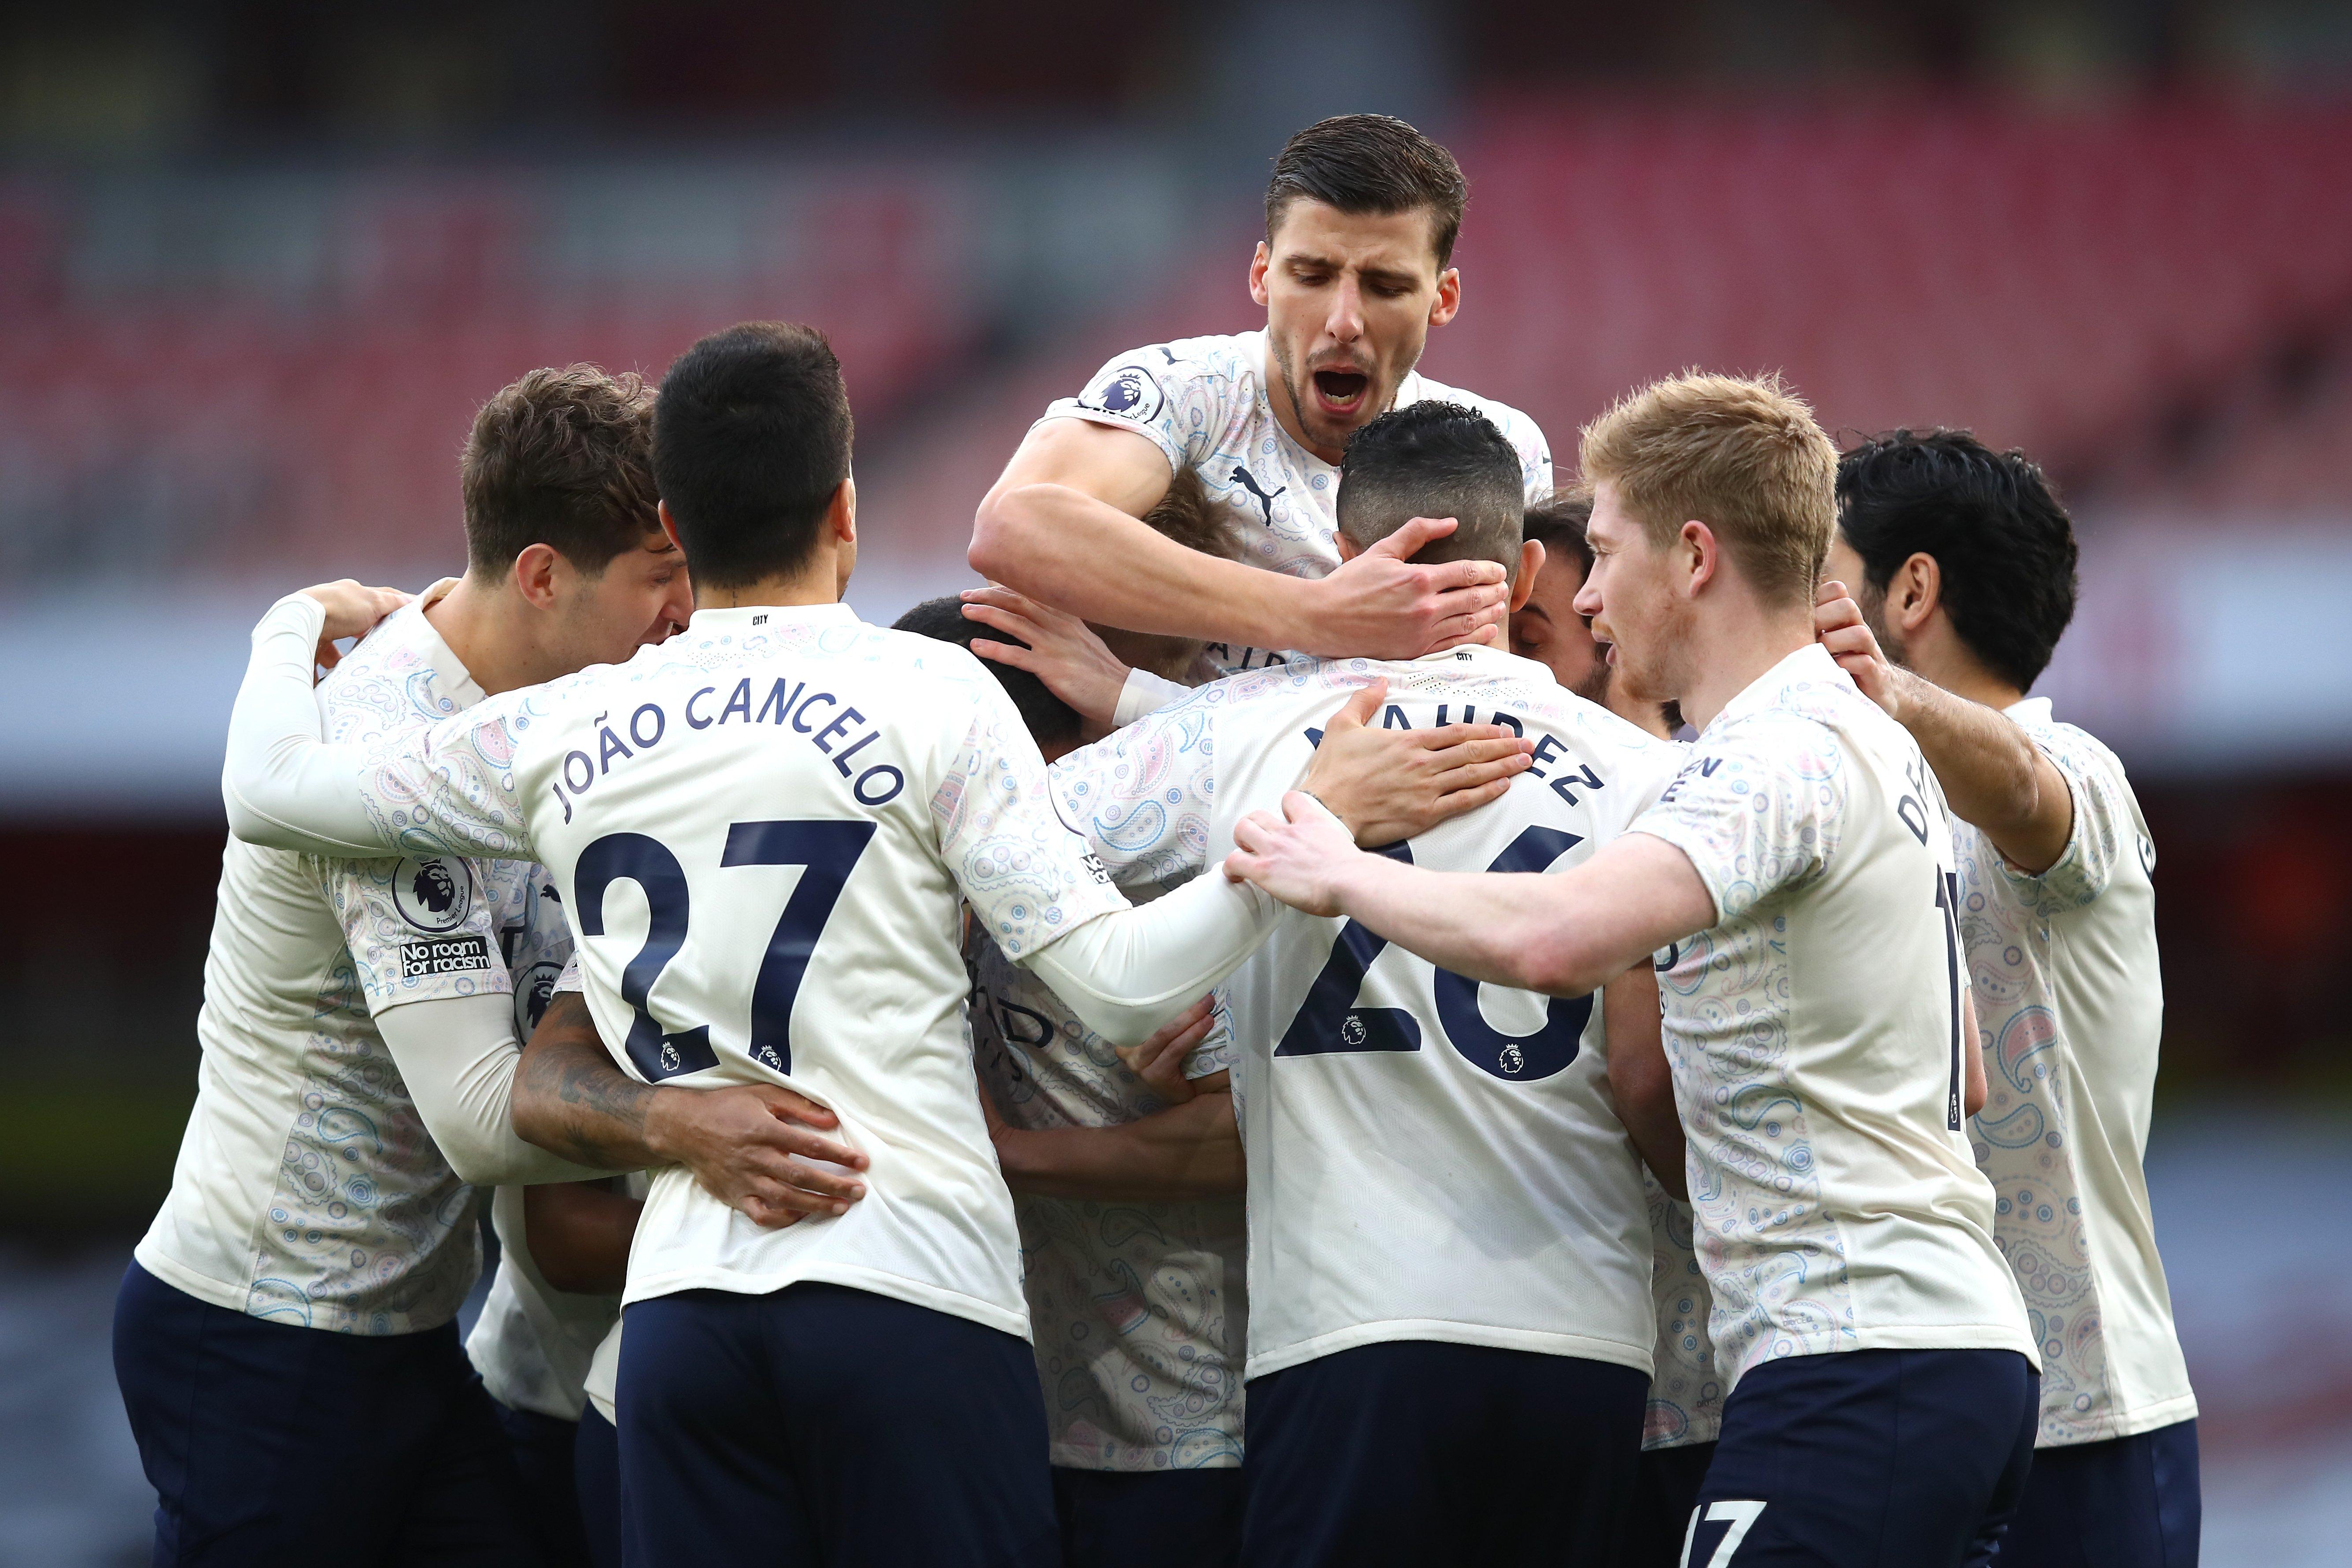 Manchester City's 18-match winning run broken down game-by-game